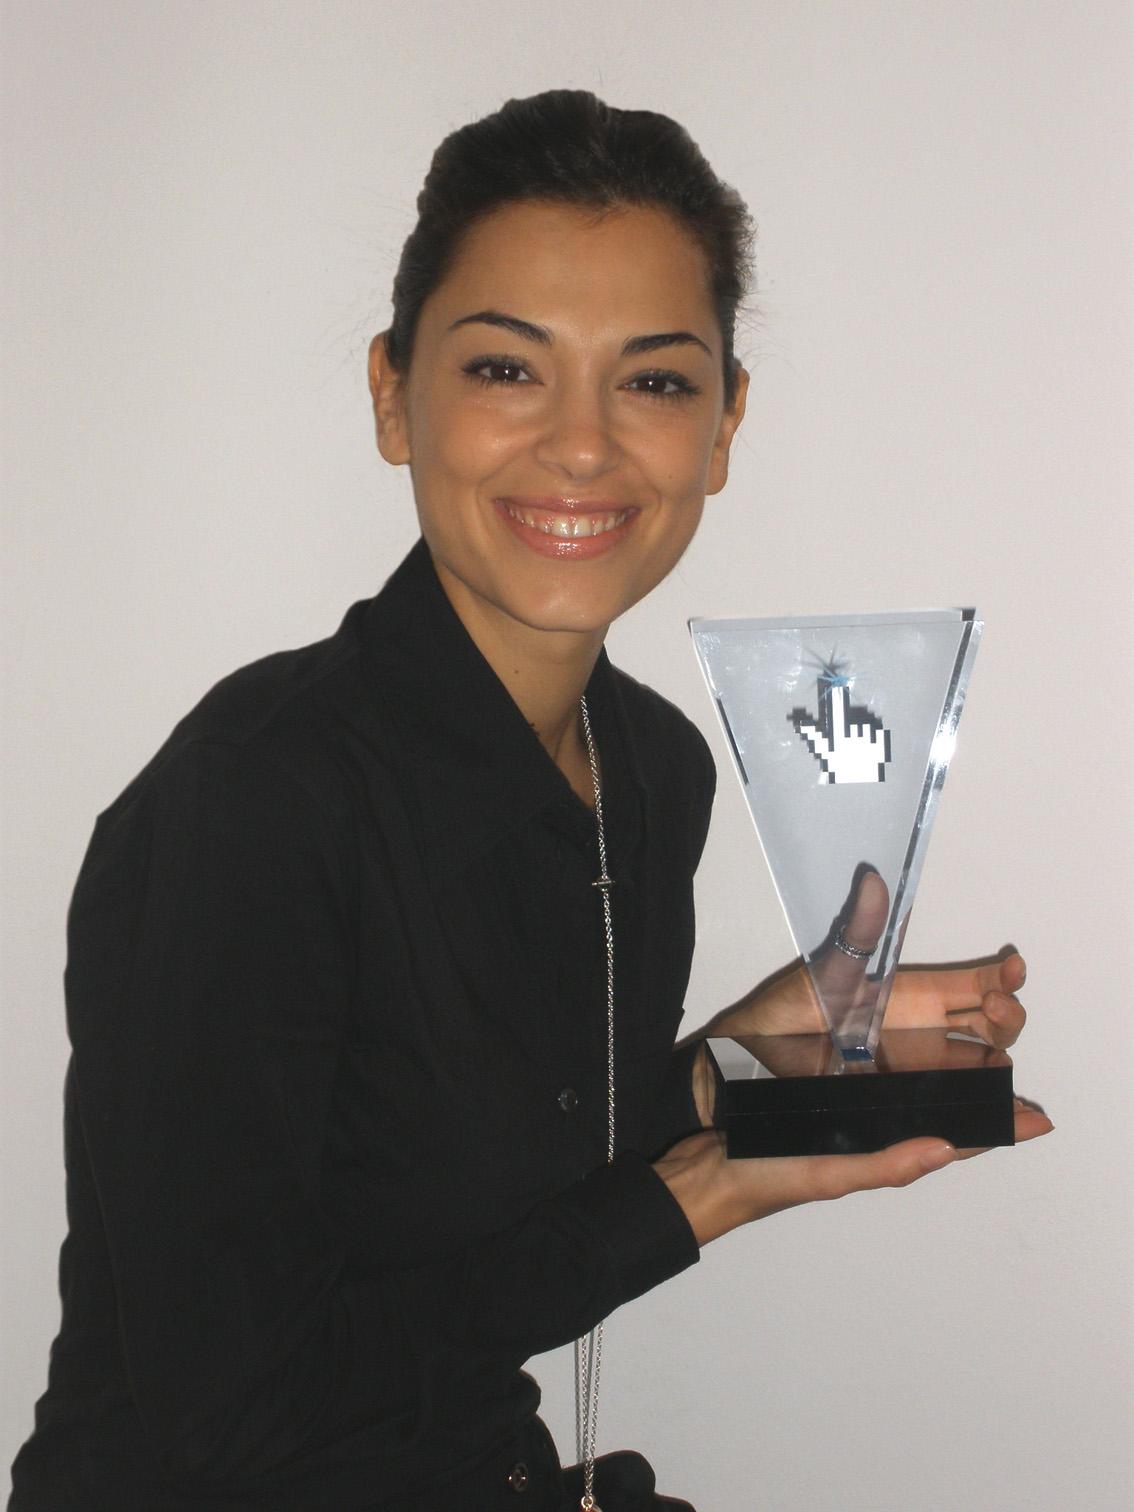 Giorgia Surina presenta l'Interactive Key Award